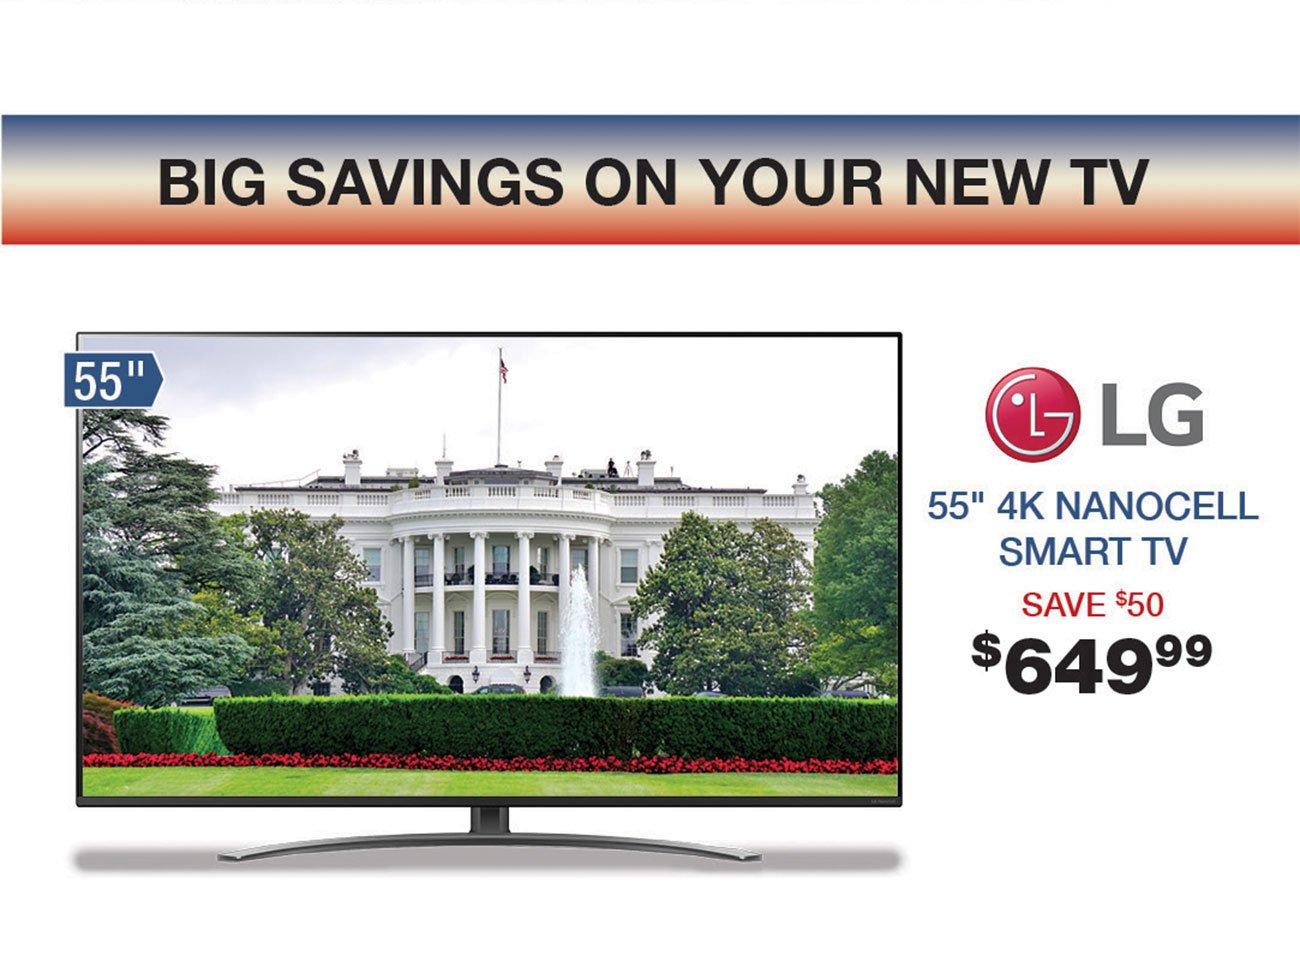 LG-55-4K-Nanocell-Smart-TV-UIRV